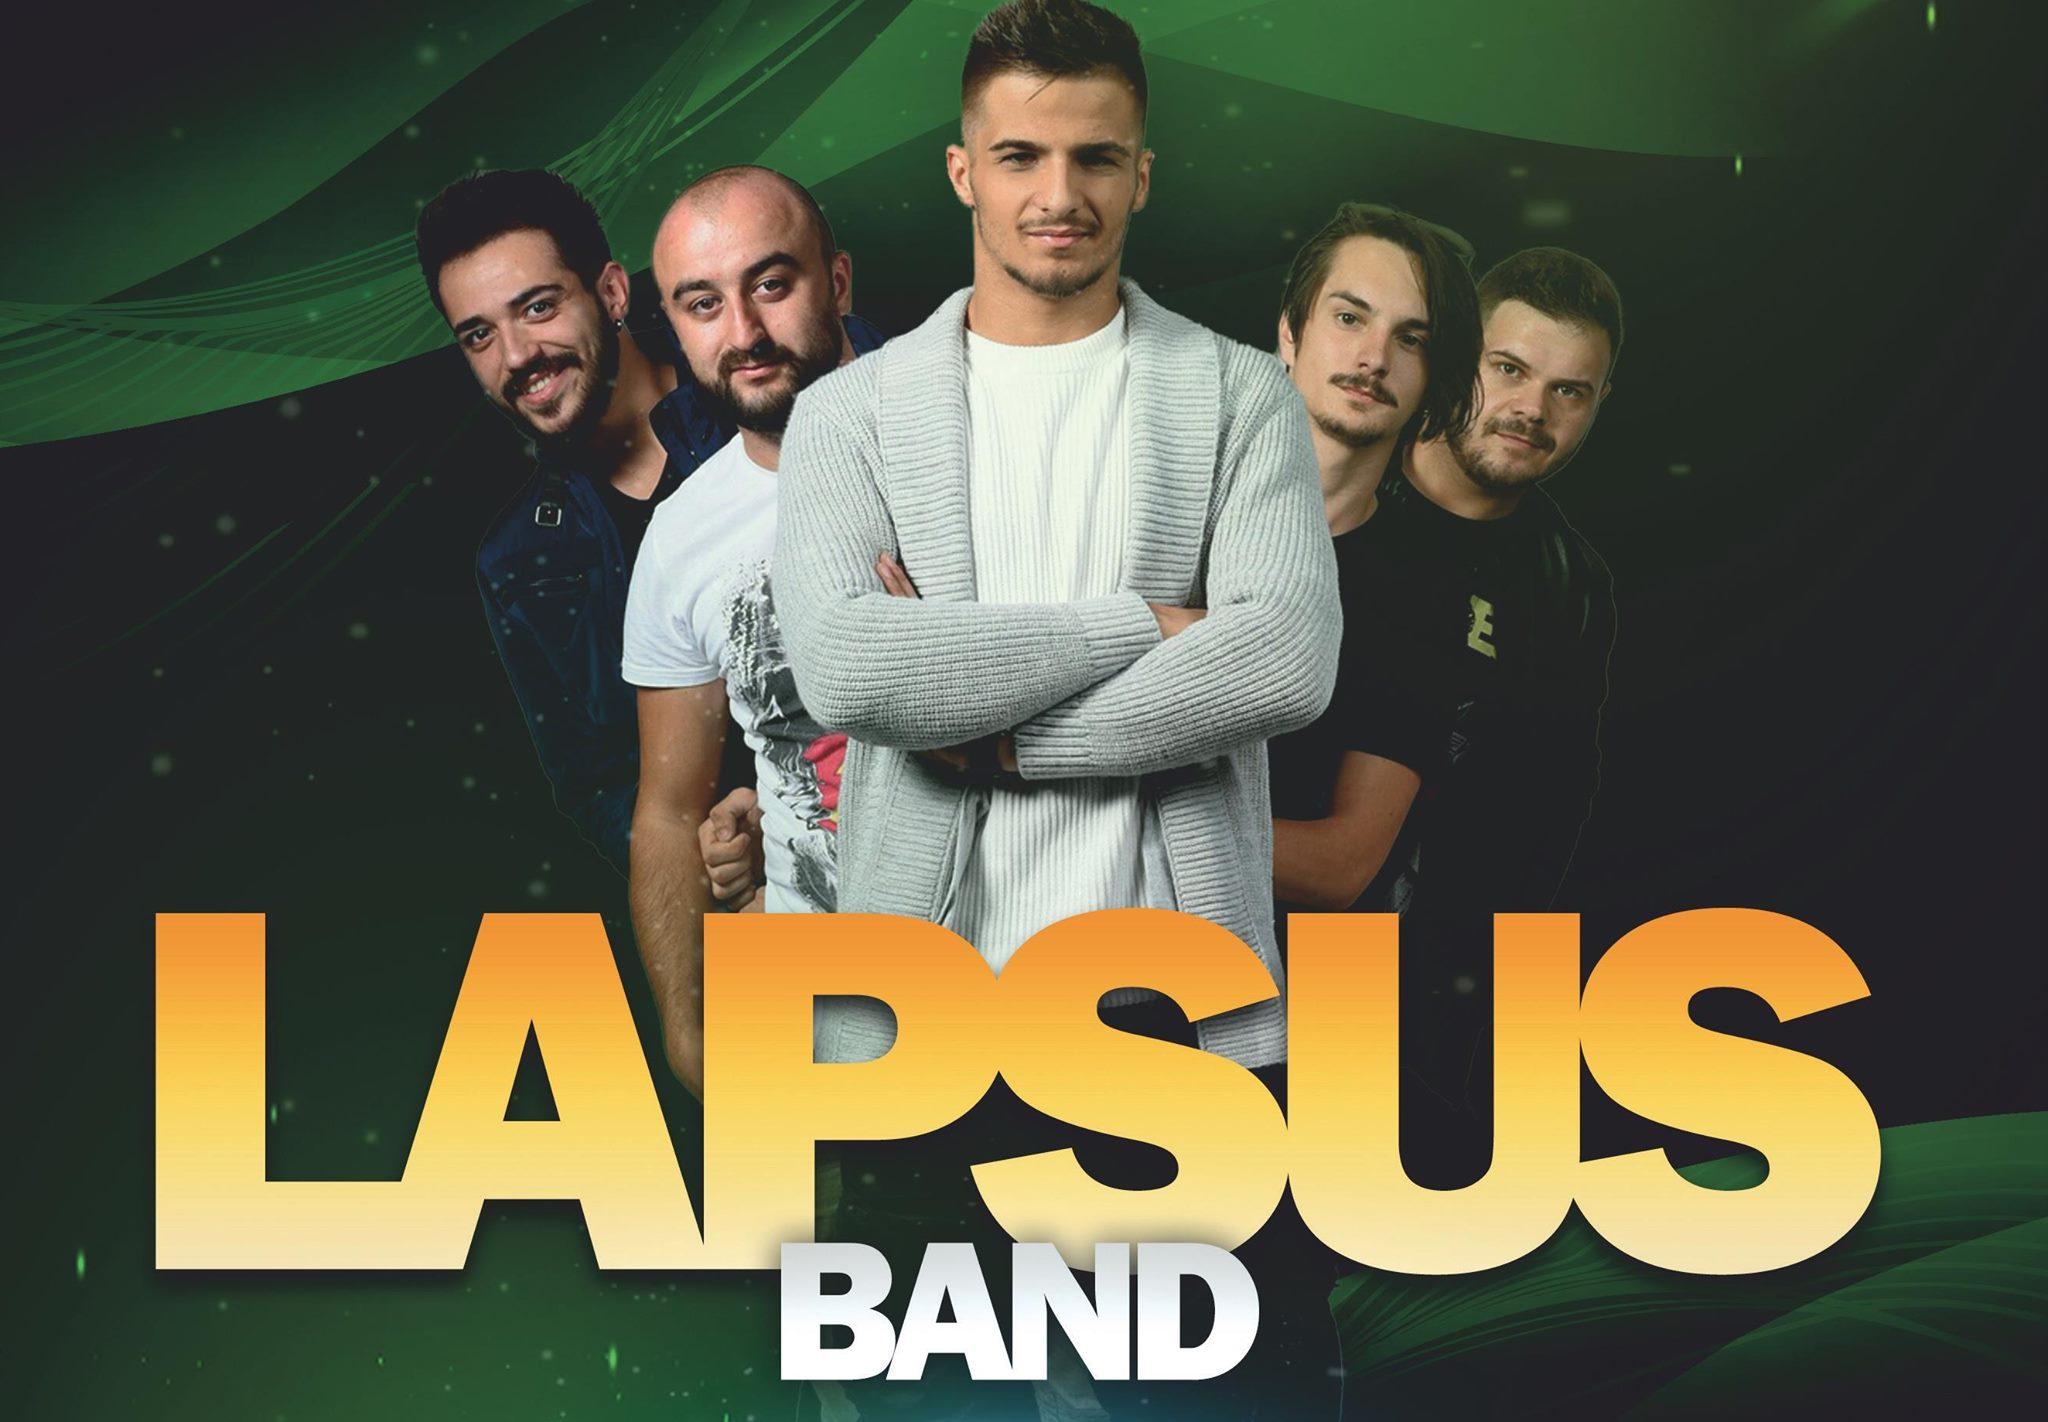 LAPSUS BAND